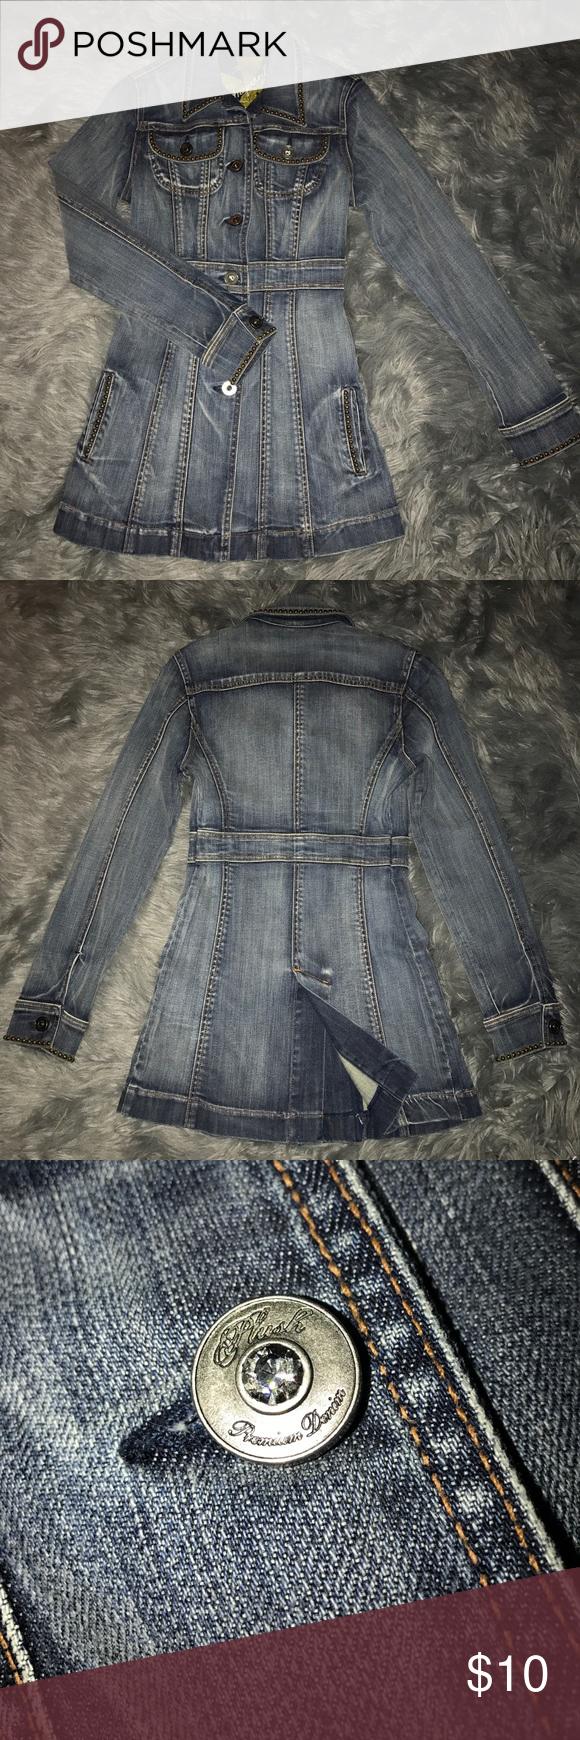 Long Button Up Denim Jacket Plush Premium Denim with pockets. Jackets & Coats Jean Jackets